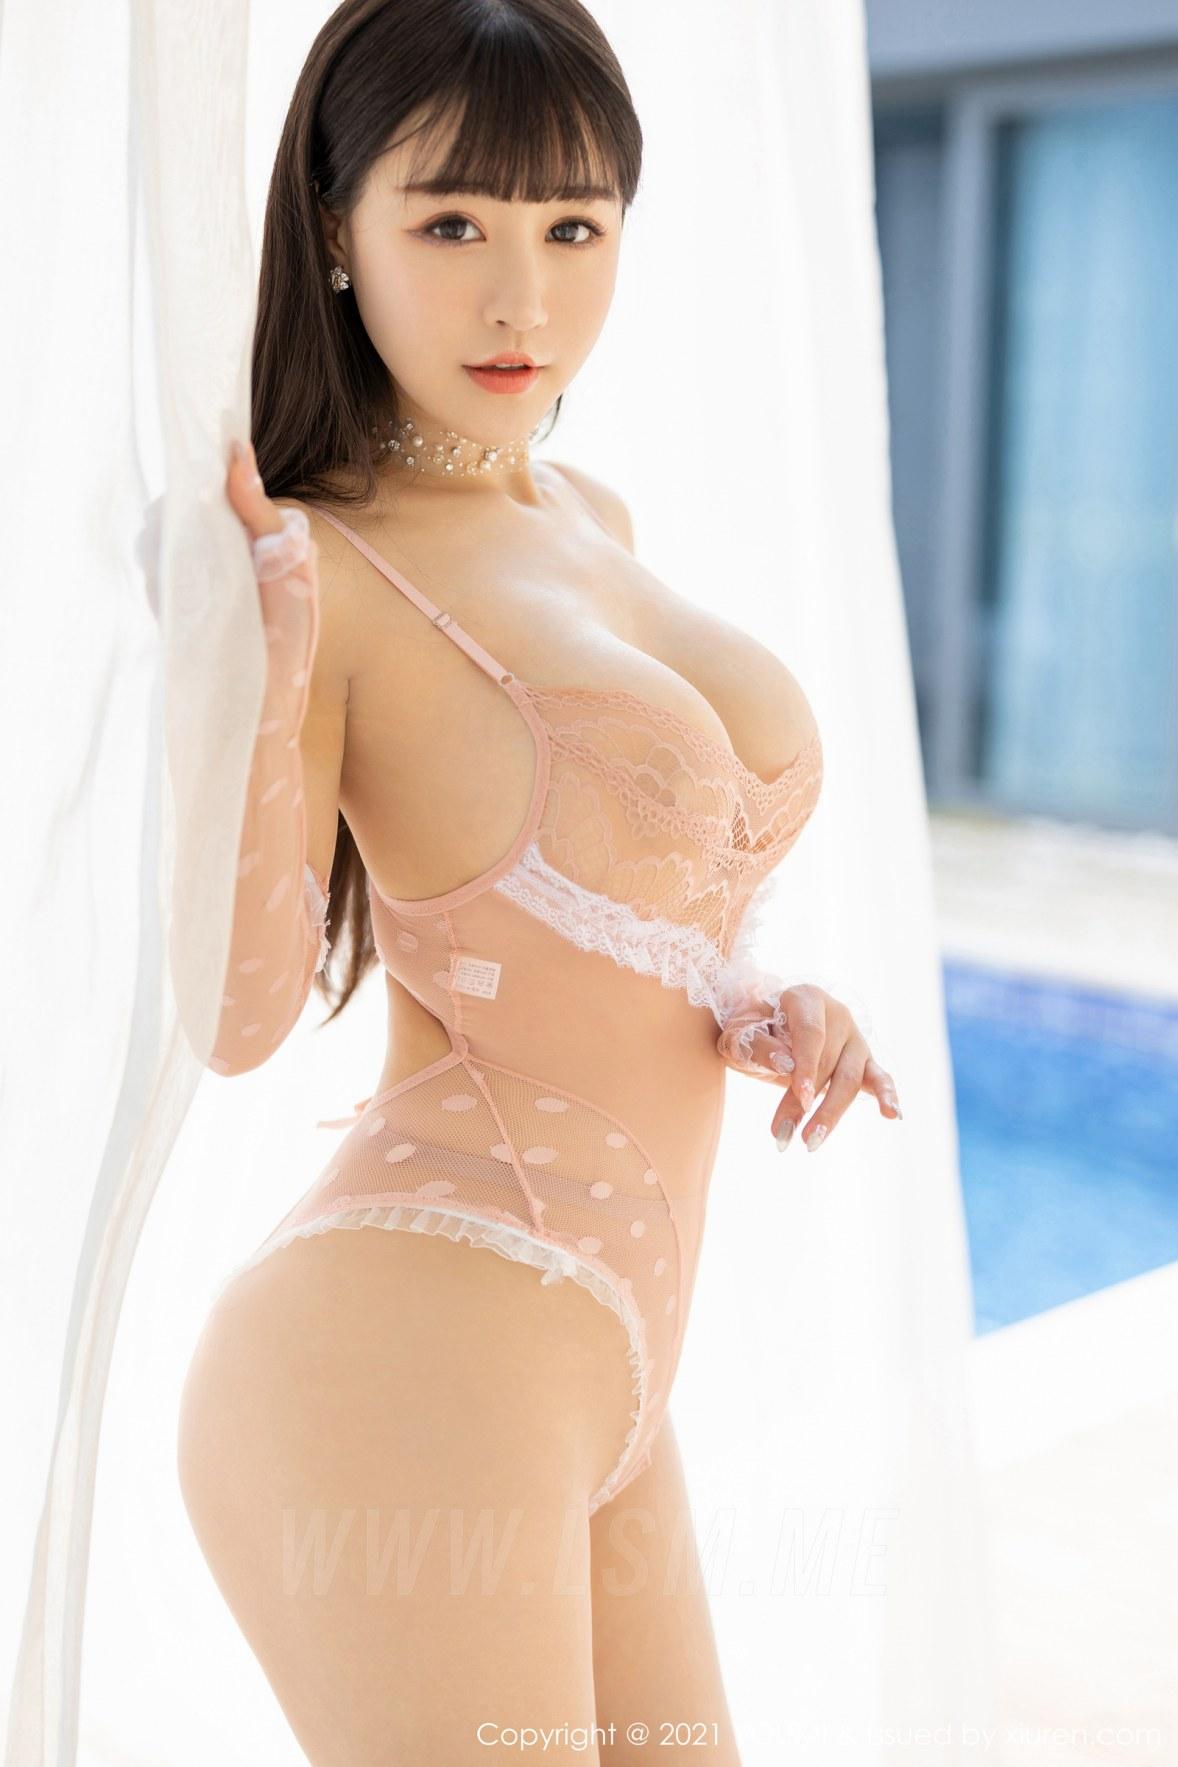 YOUMI 尤蜜荟 Vol.624 细腻粉色镂空服饰 朱可儿Flower 三亚旅拍 - 3